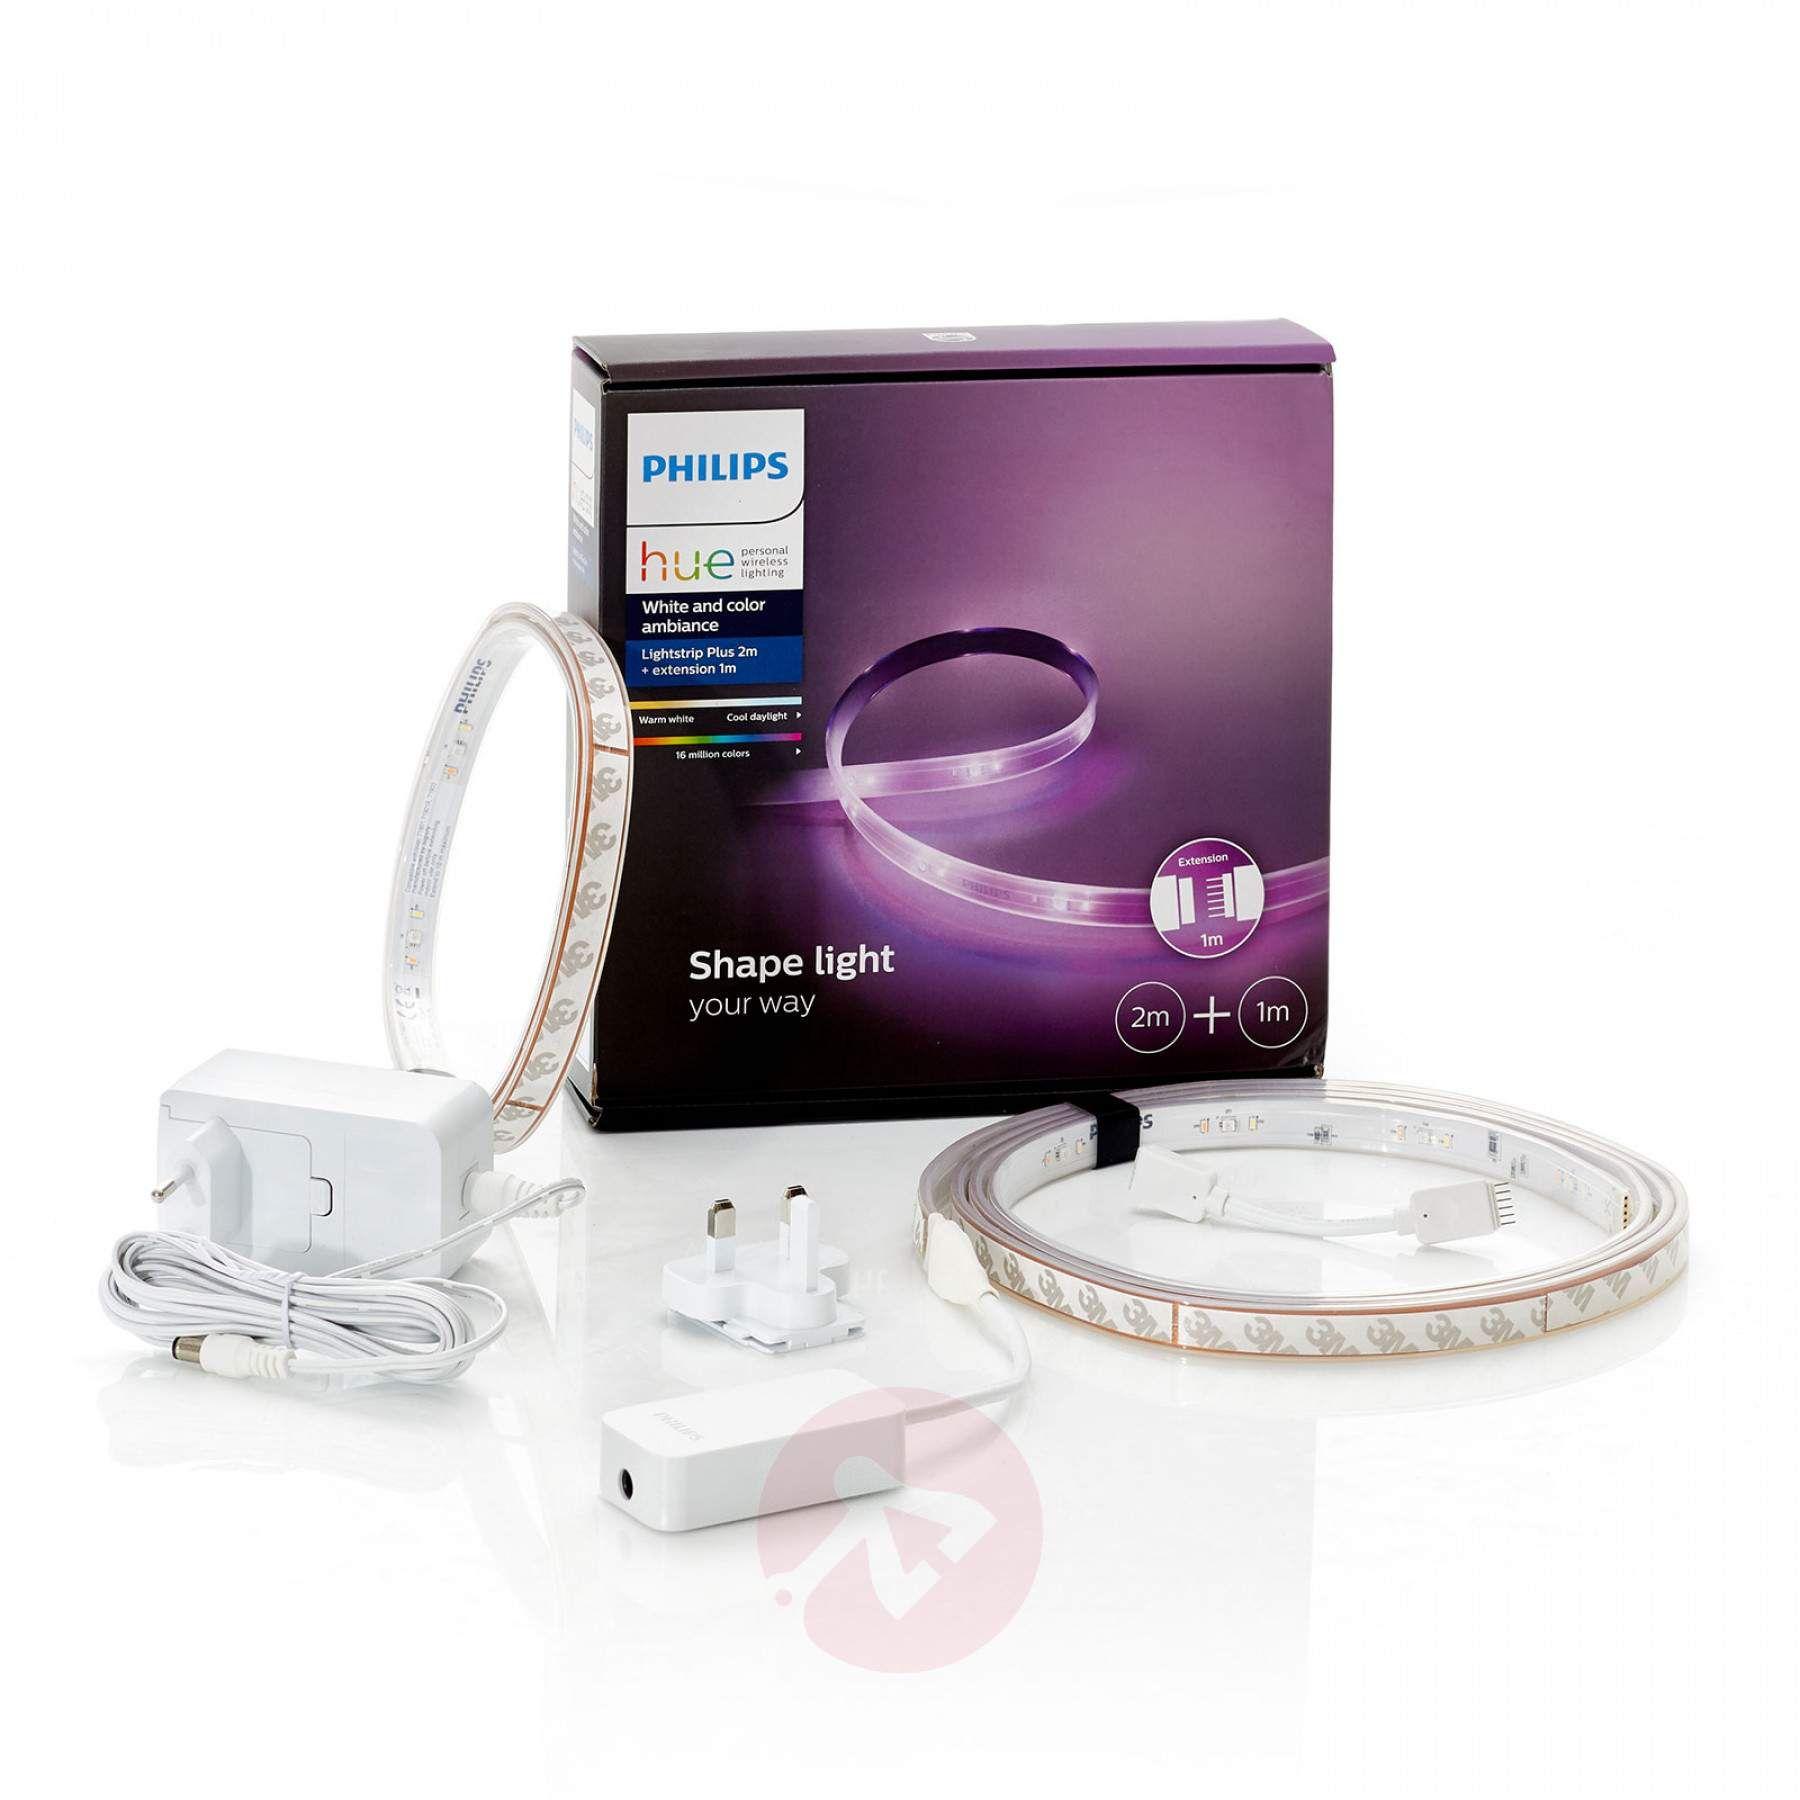 LightStrip Plus White and Color Ambiance für bestehendes Philips Hue-System - Sonderedition als 2+1m extra Bundle